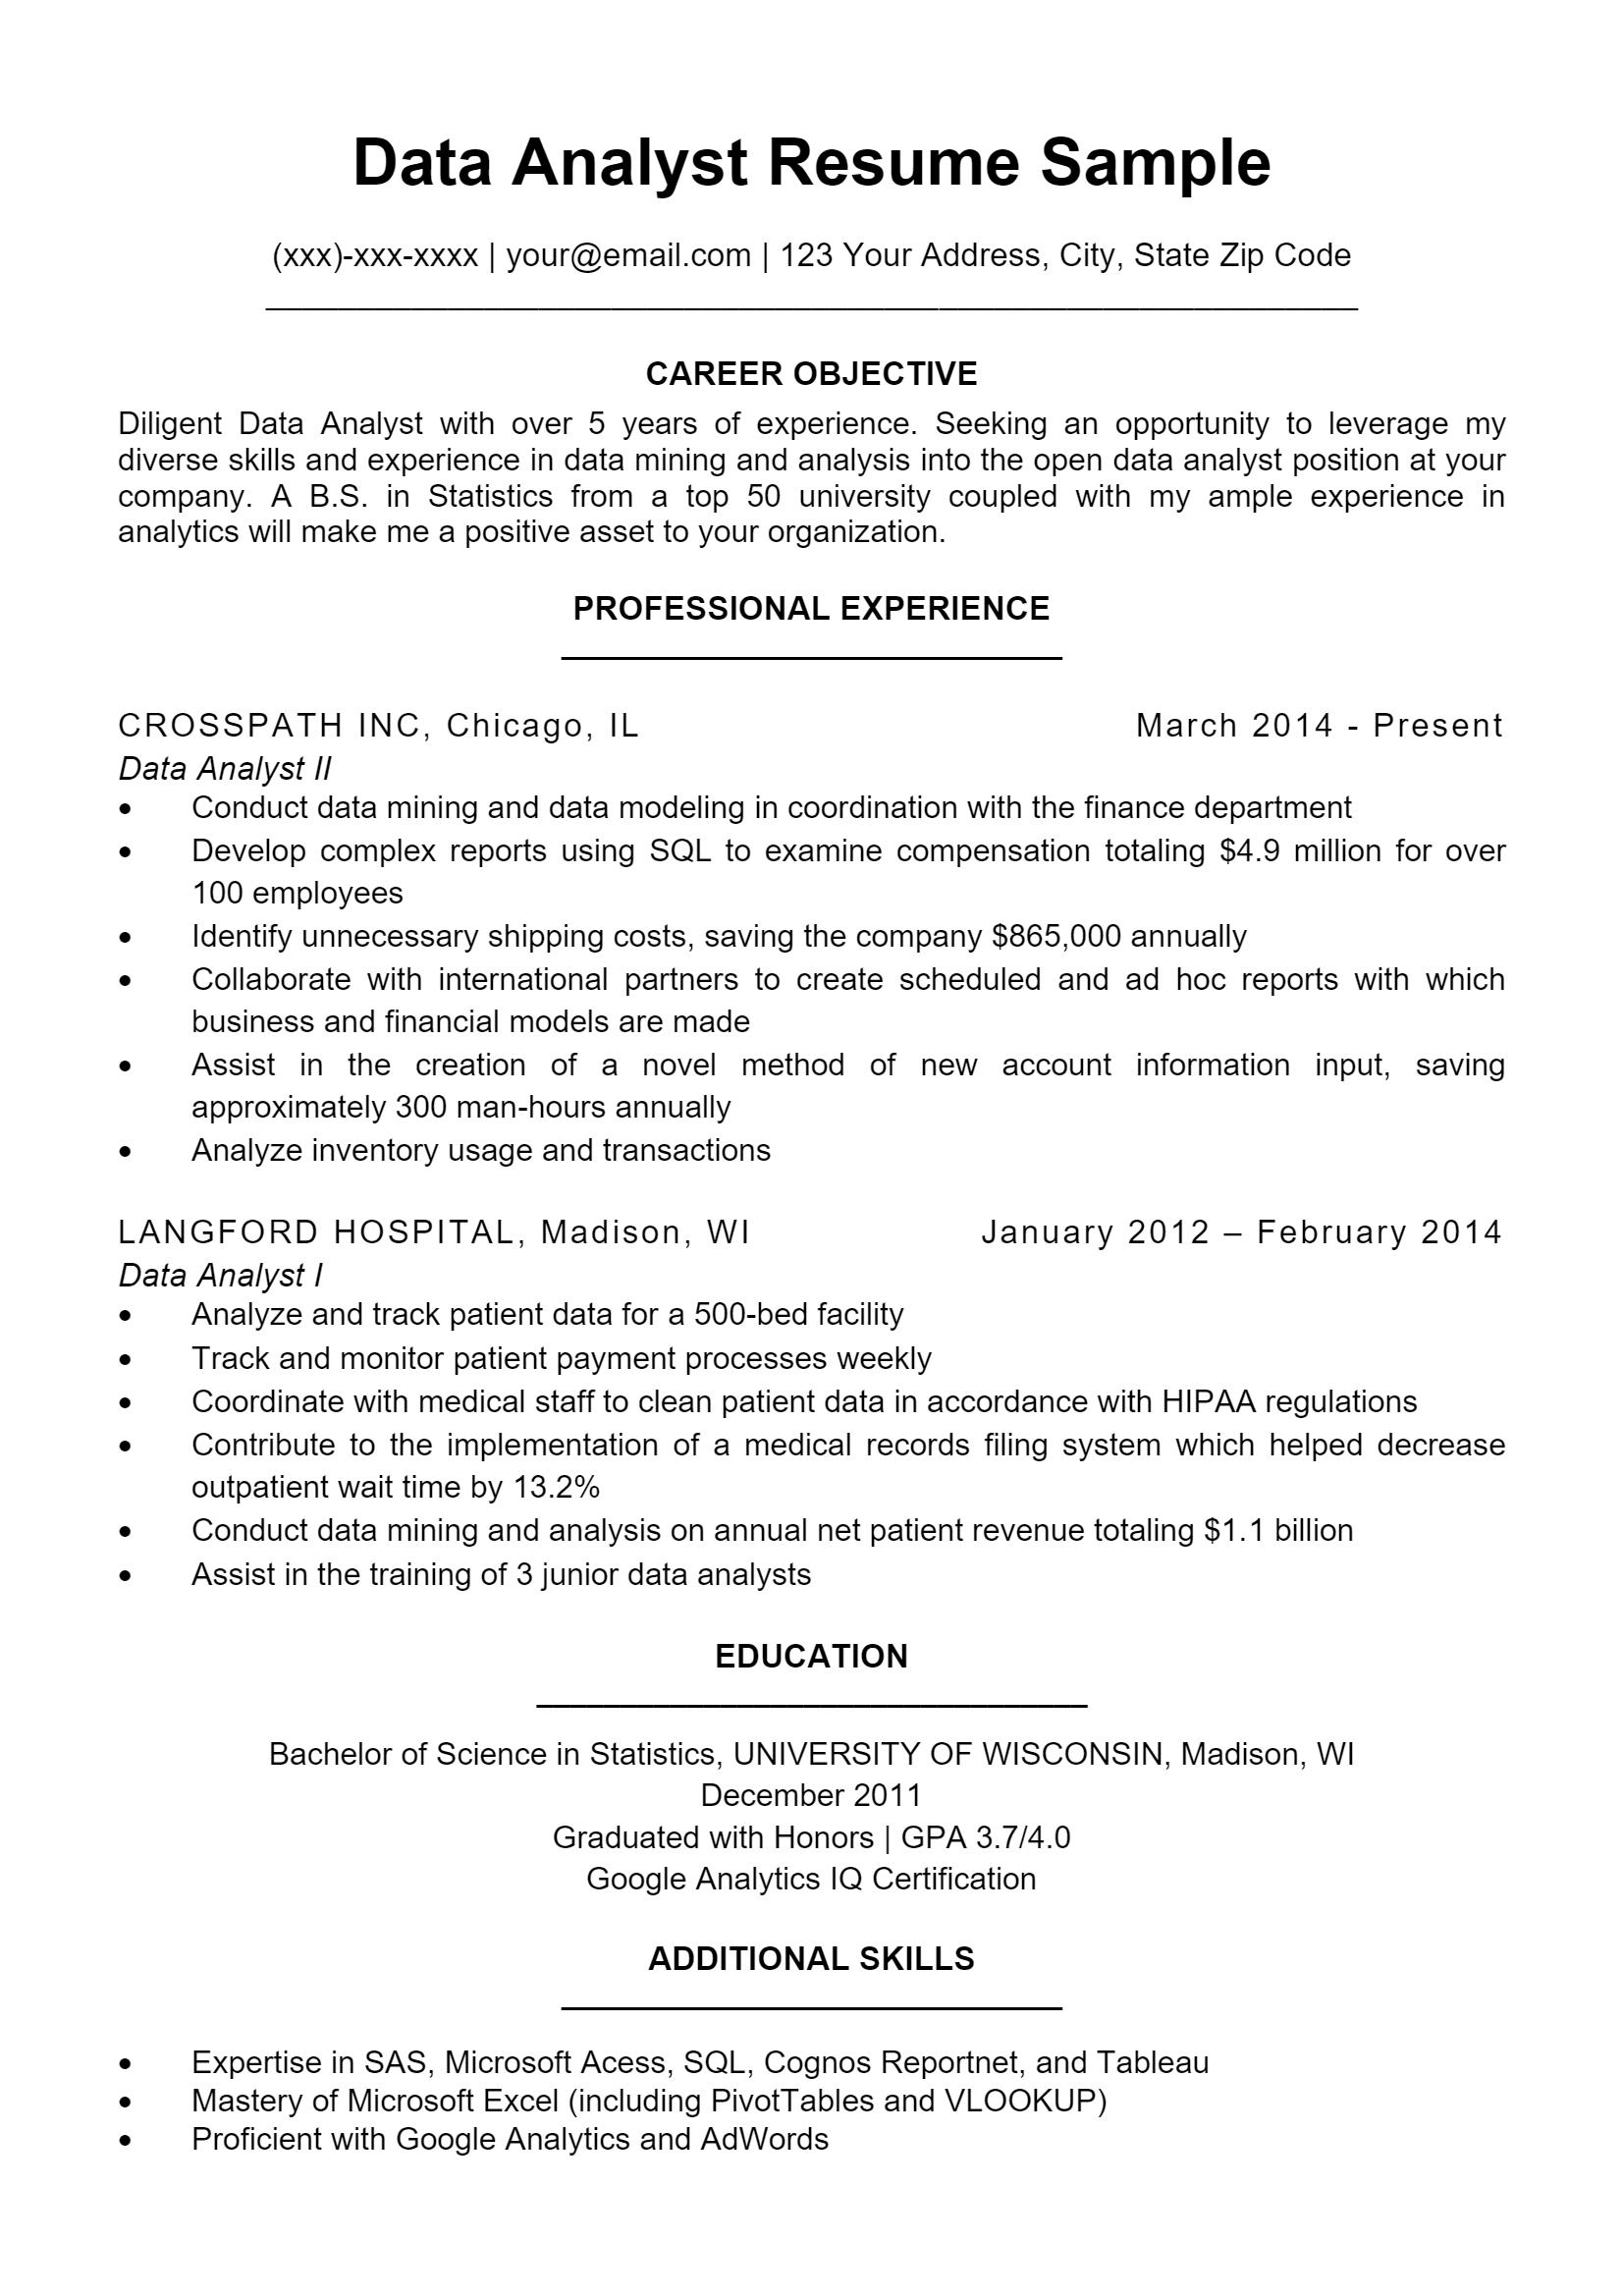 Data Analyst Resume .Docx (Word)